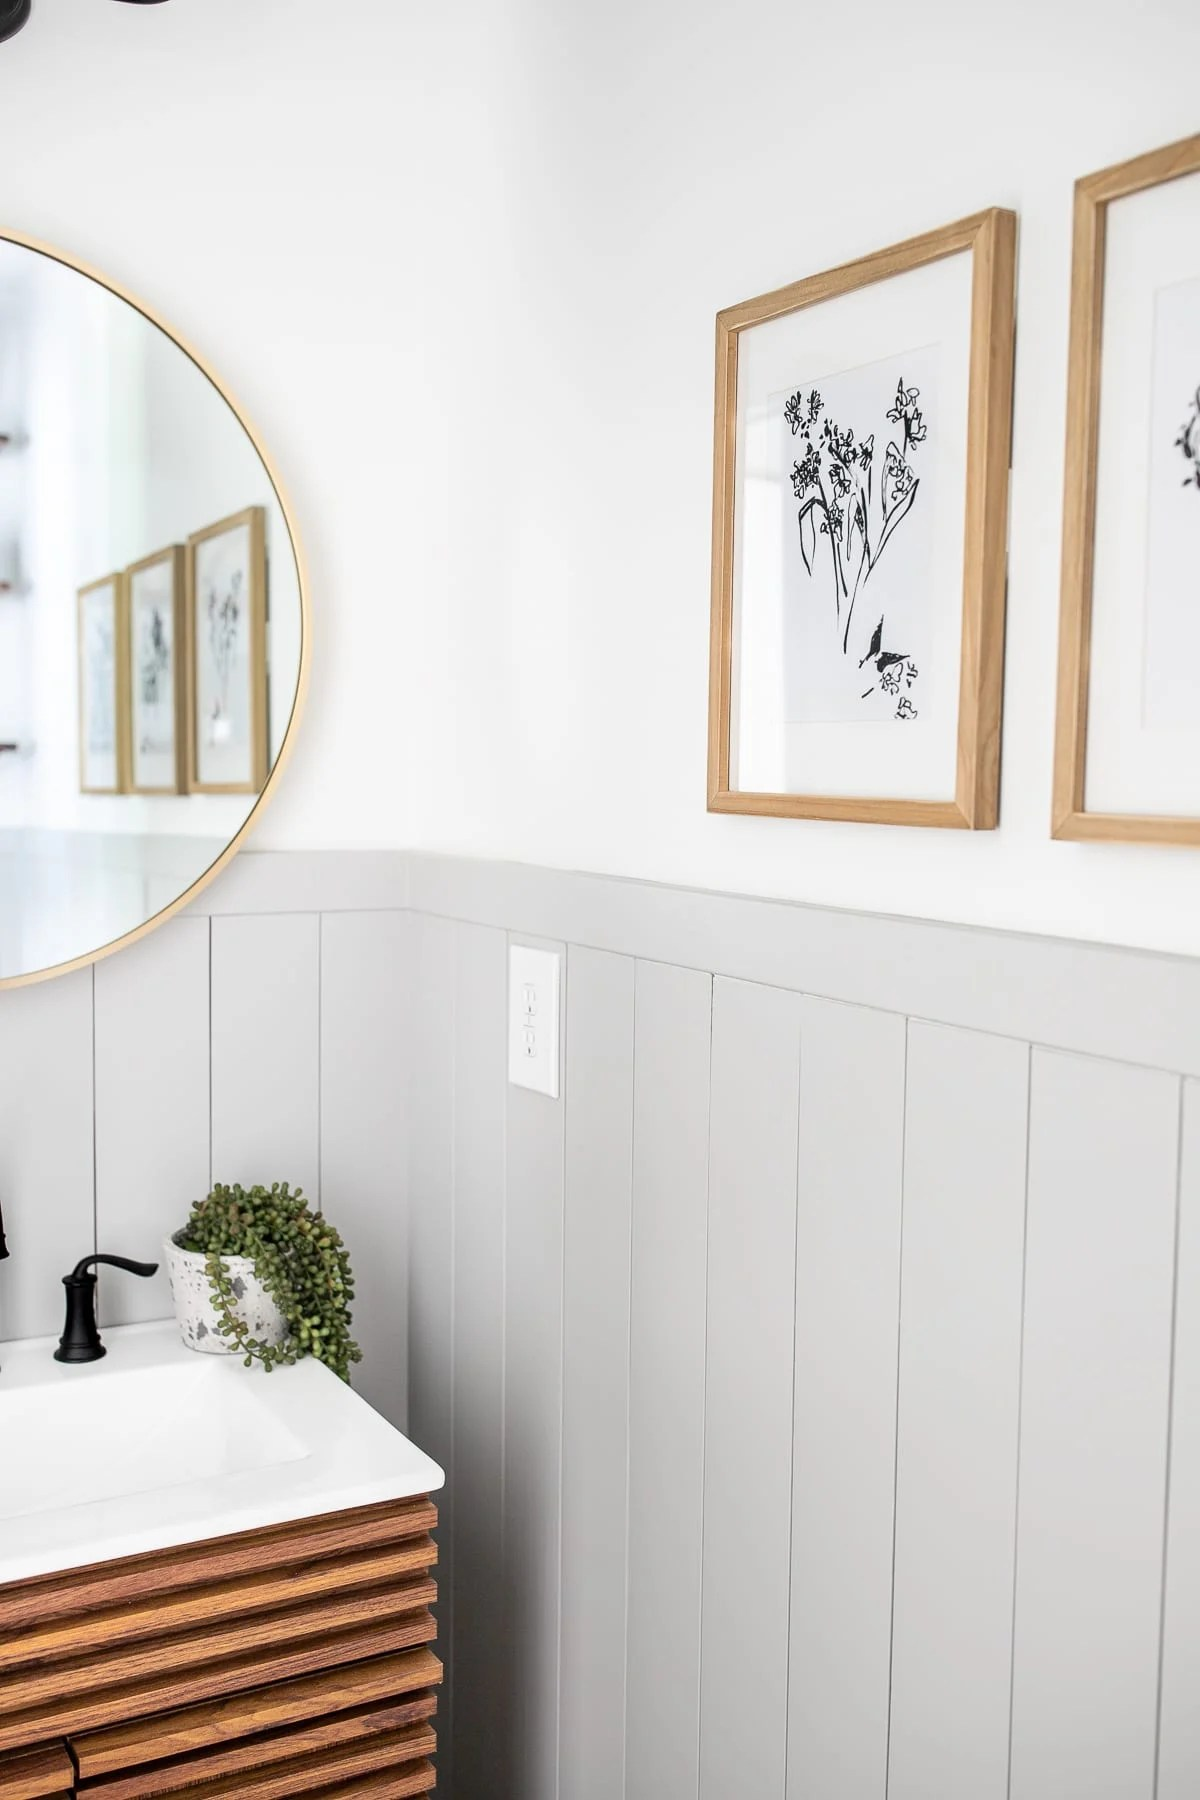 California Casual modern powder room with minimalist botanical art